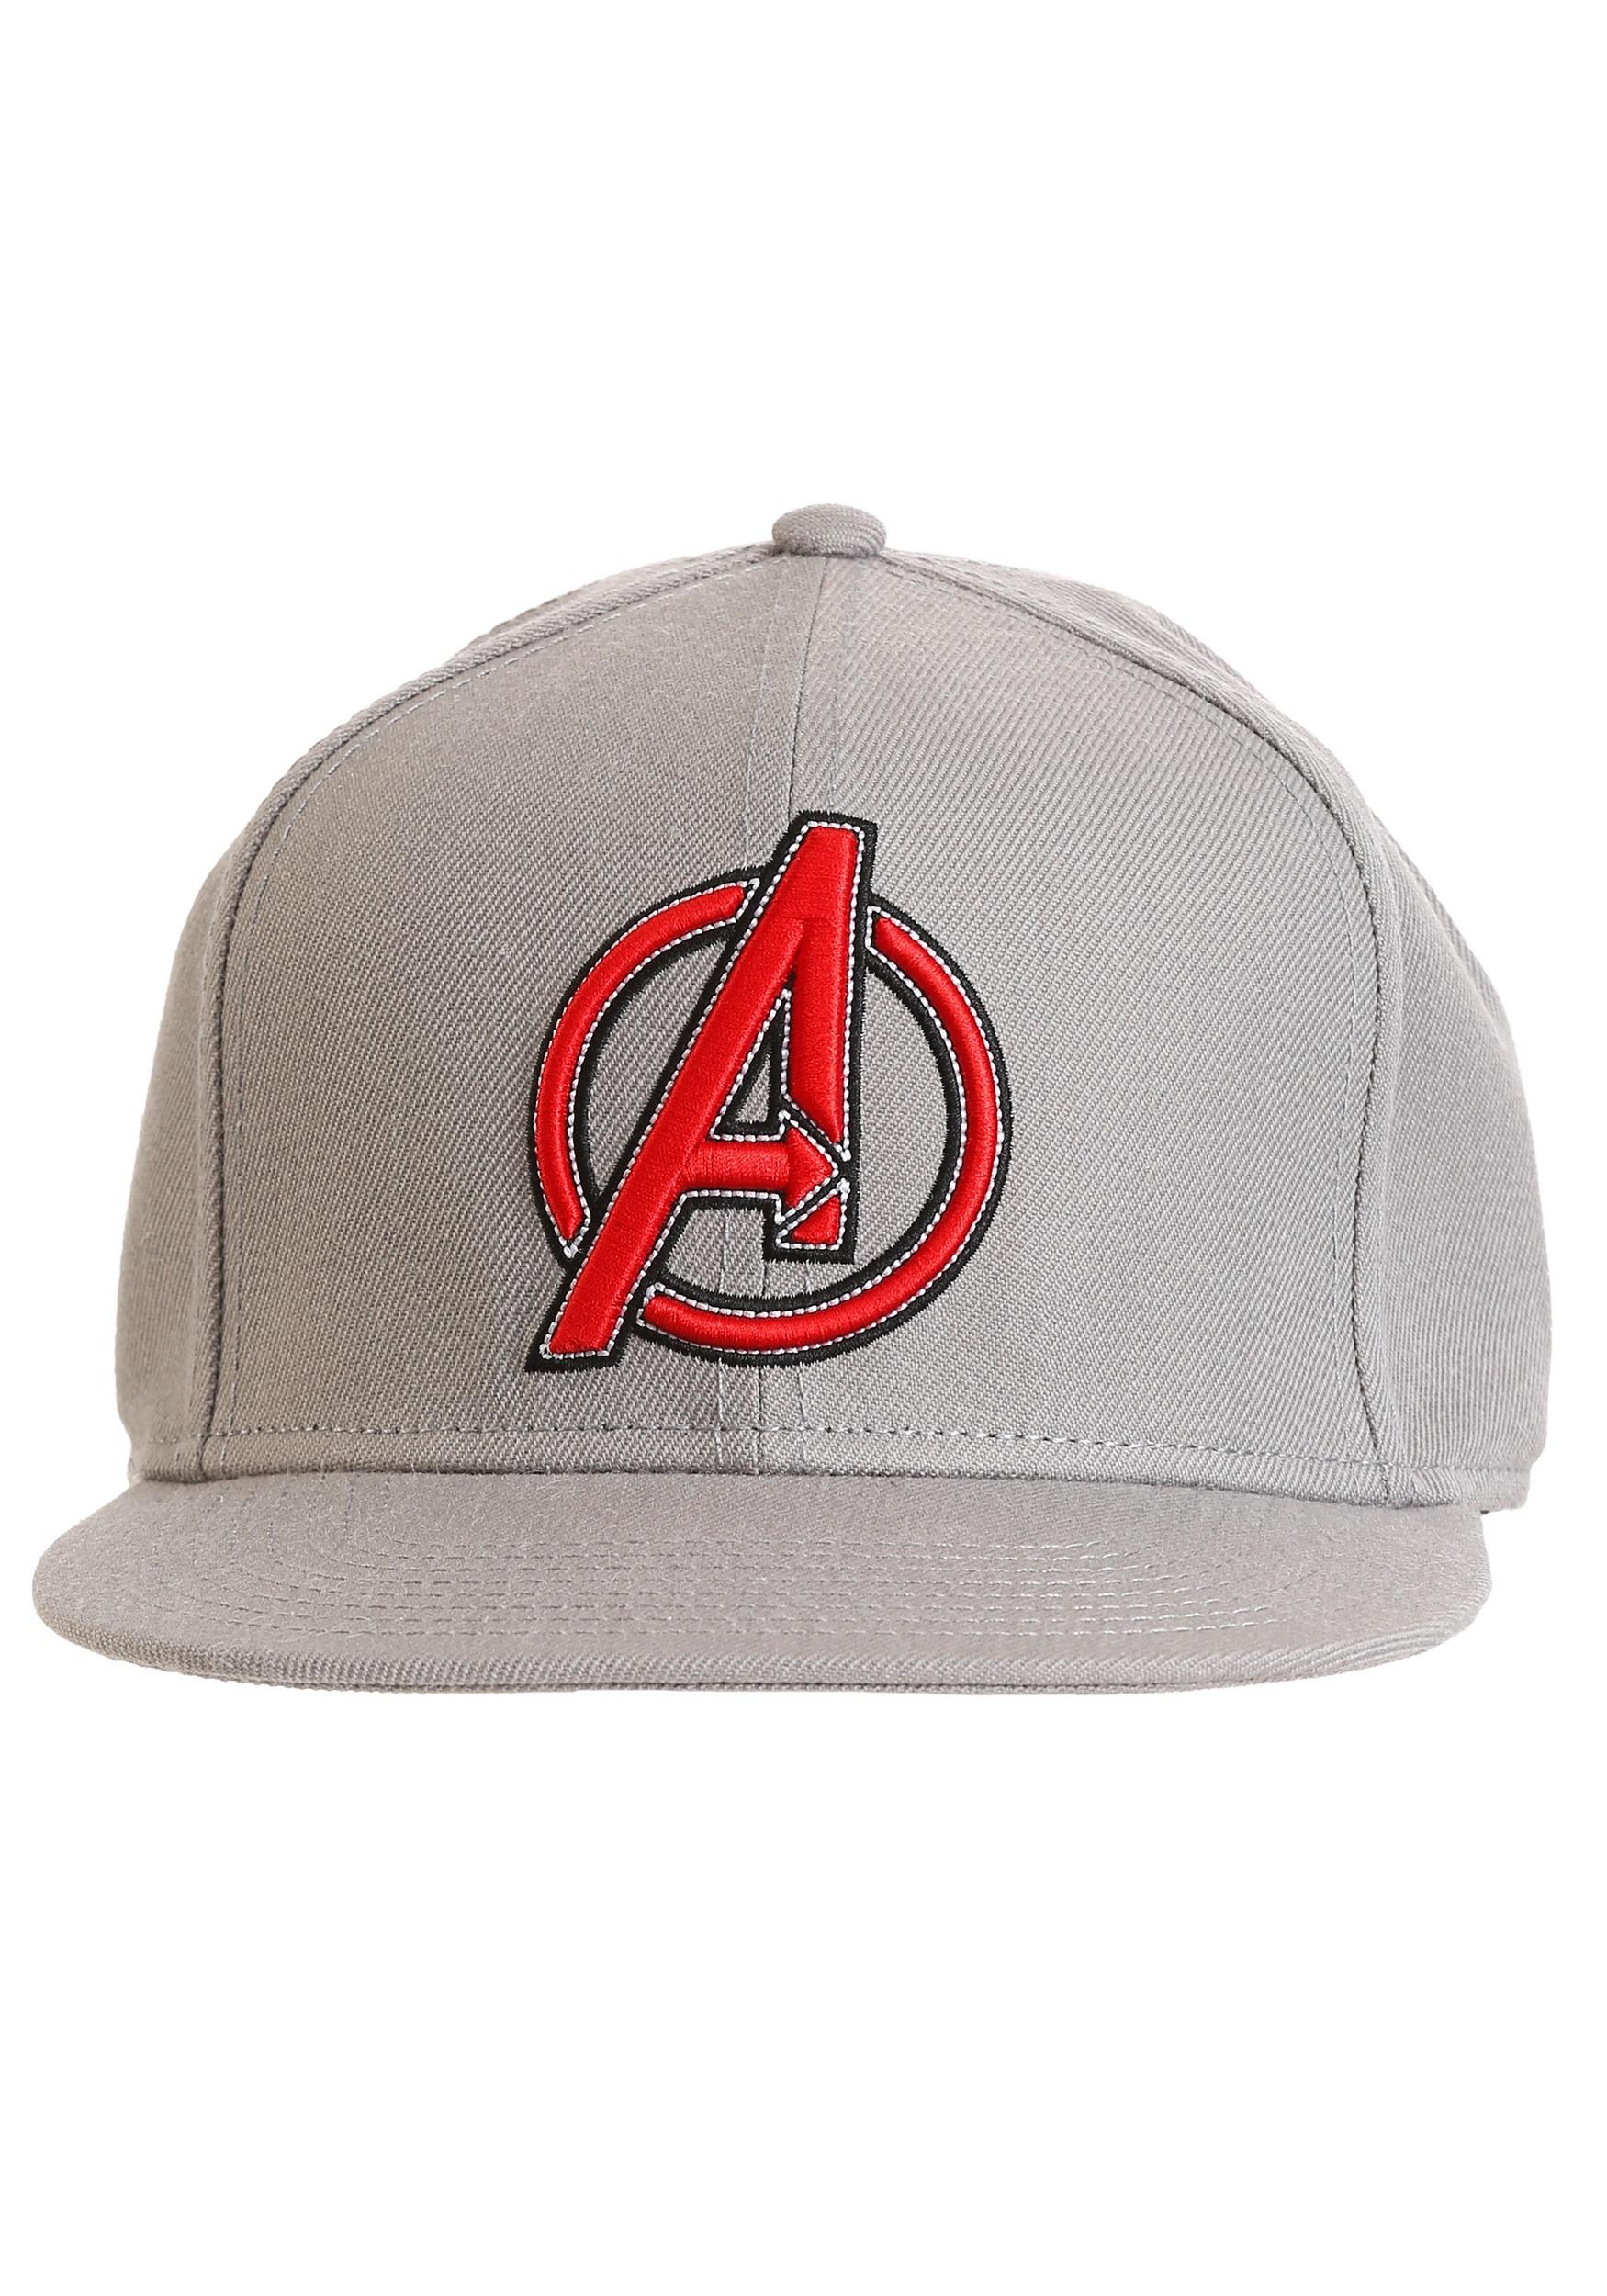 Snap Back Avengers Logo Hat